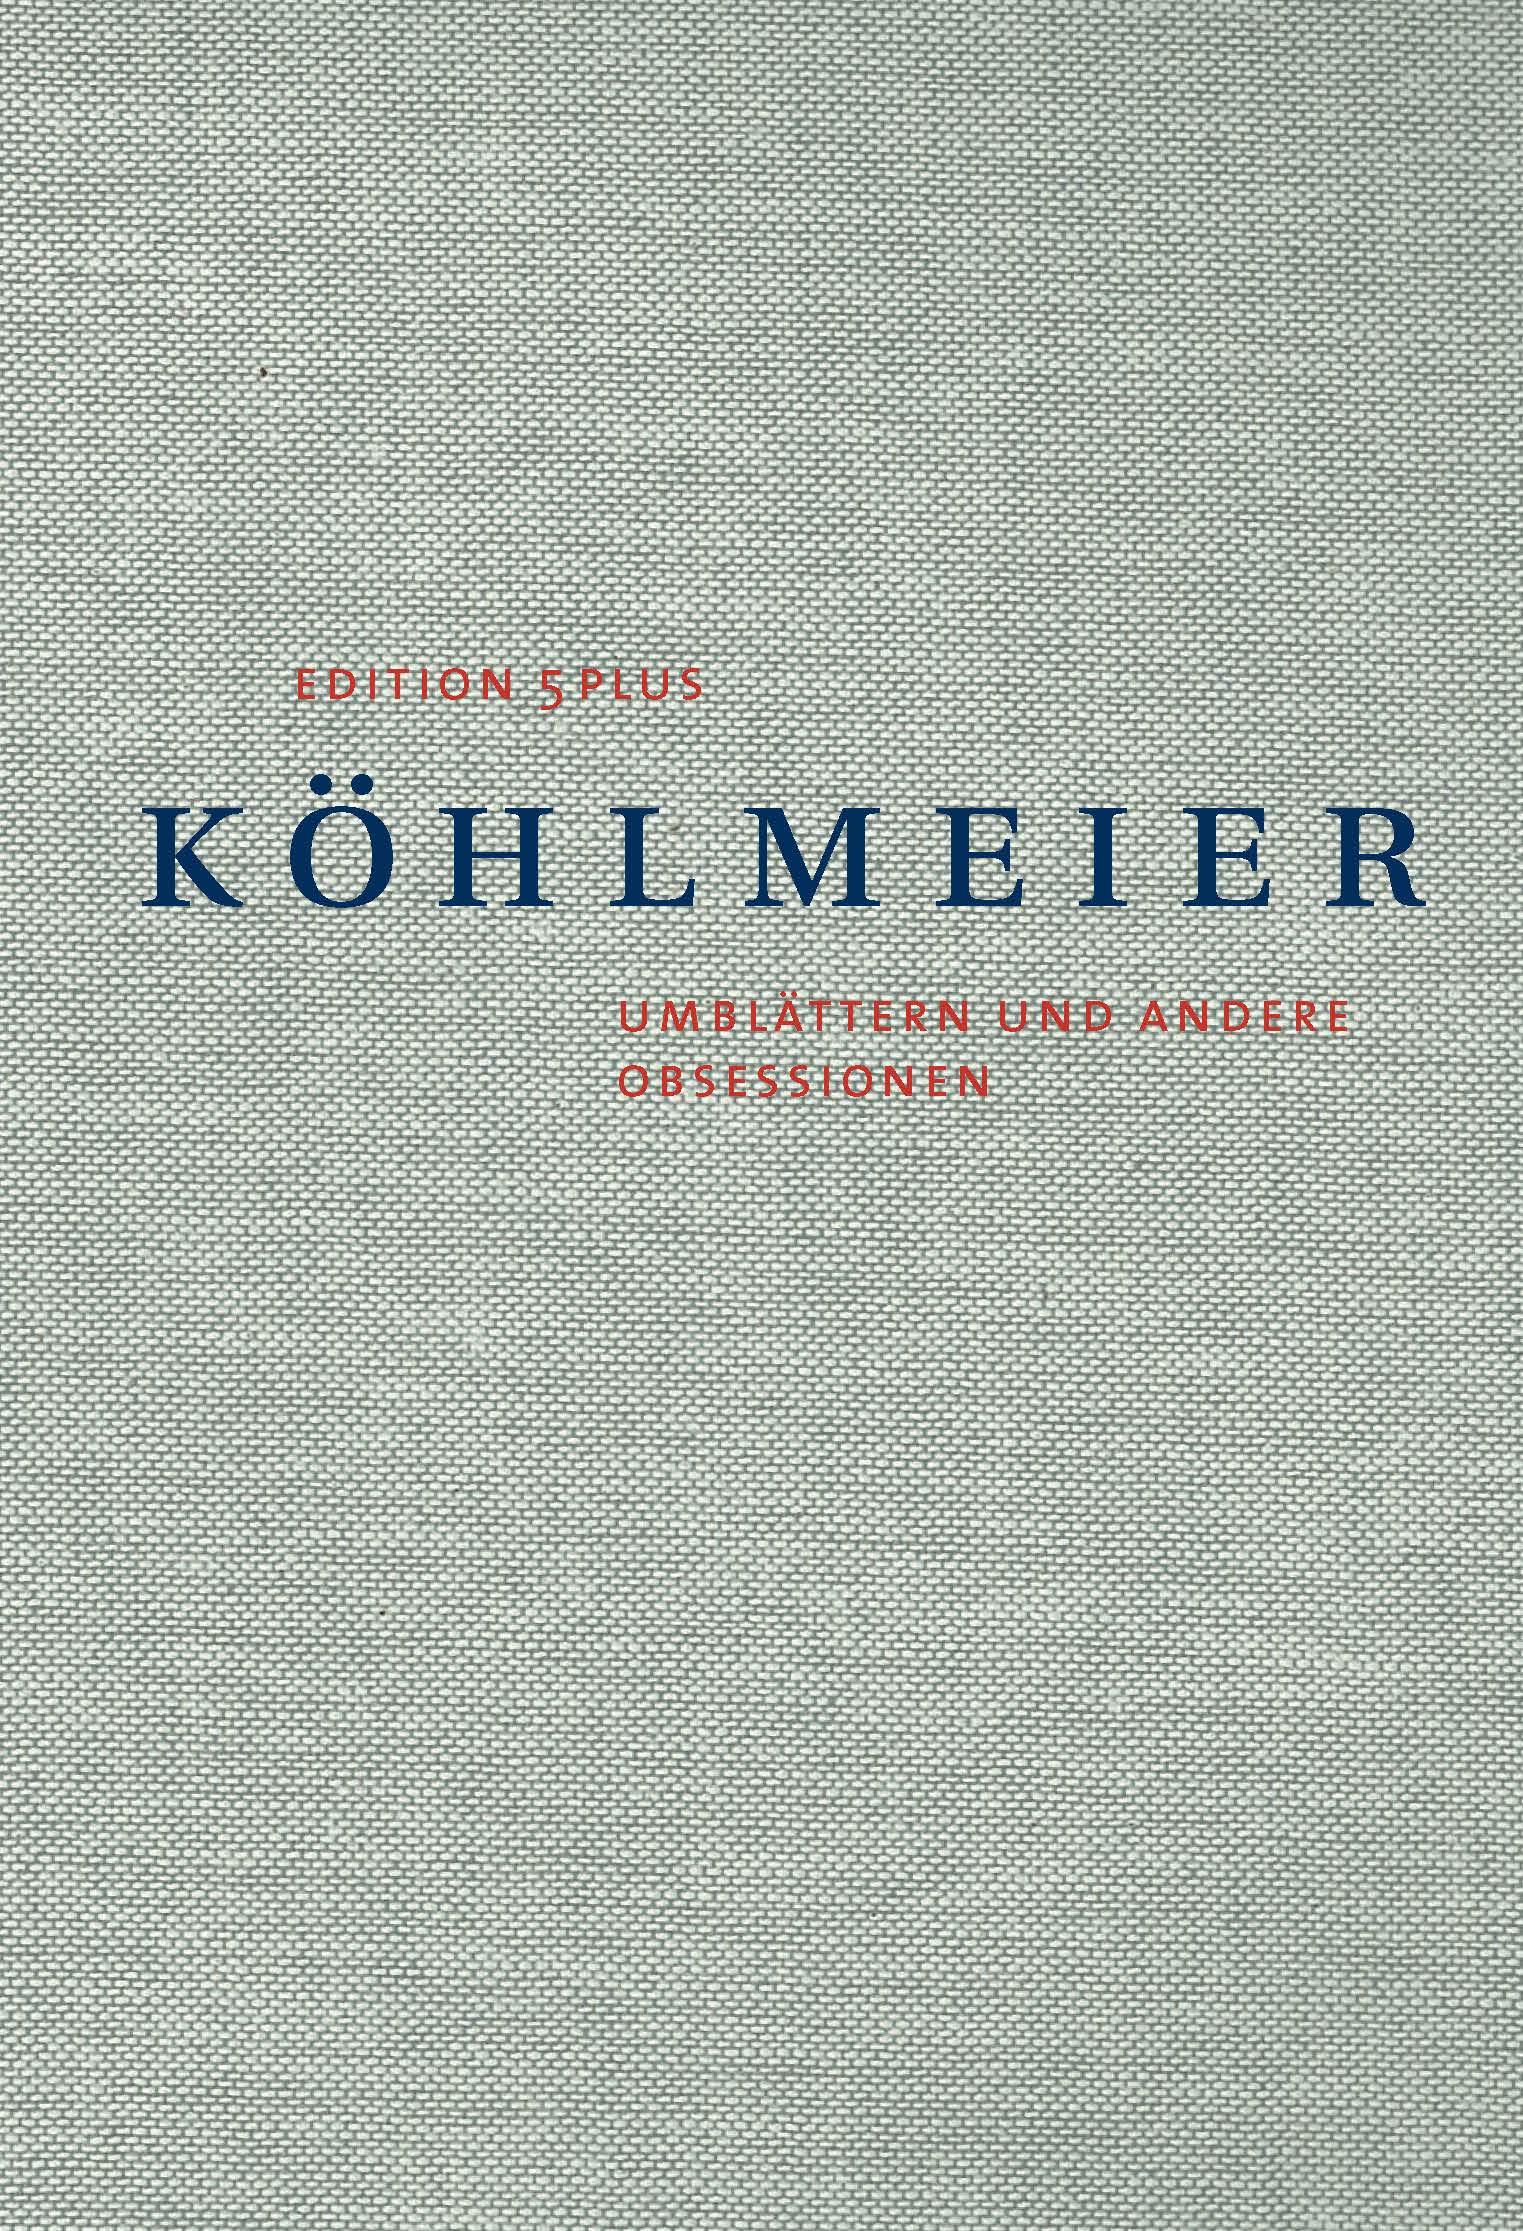 Michael Köhlmeier. Umblättern und andere Obsessionen. Edition 5plus